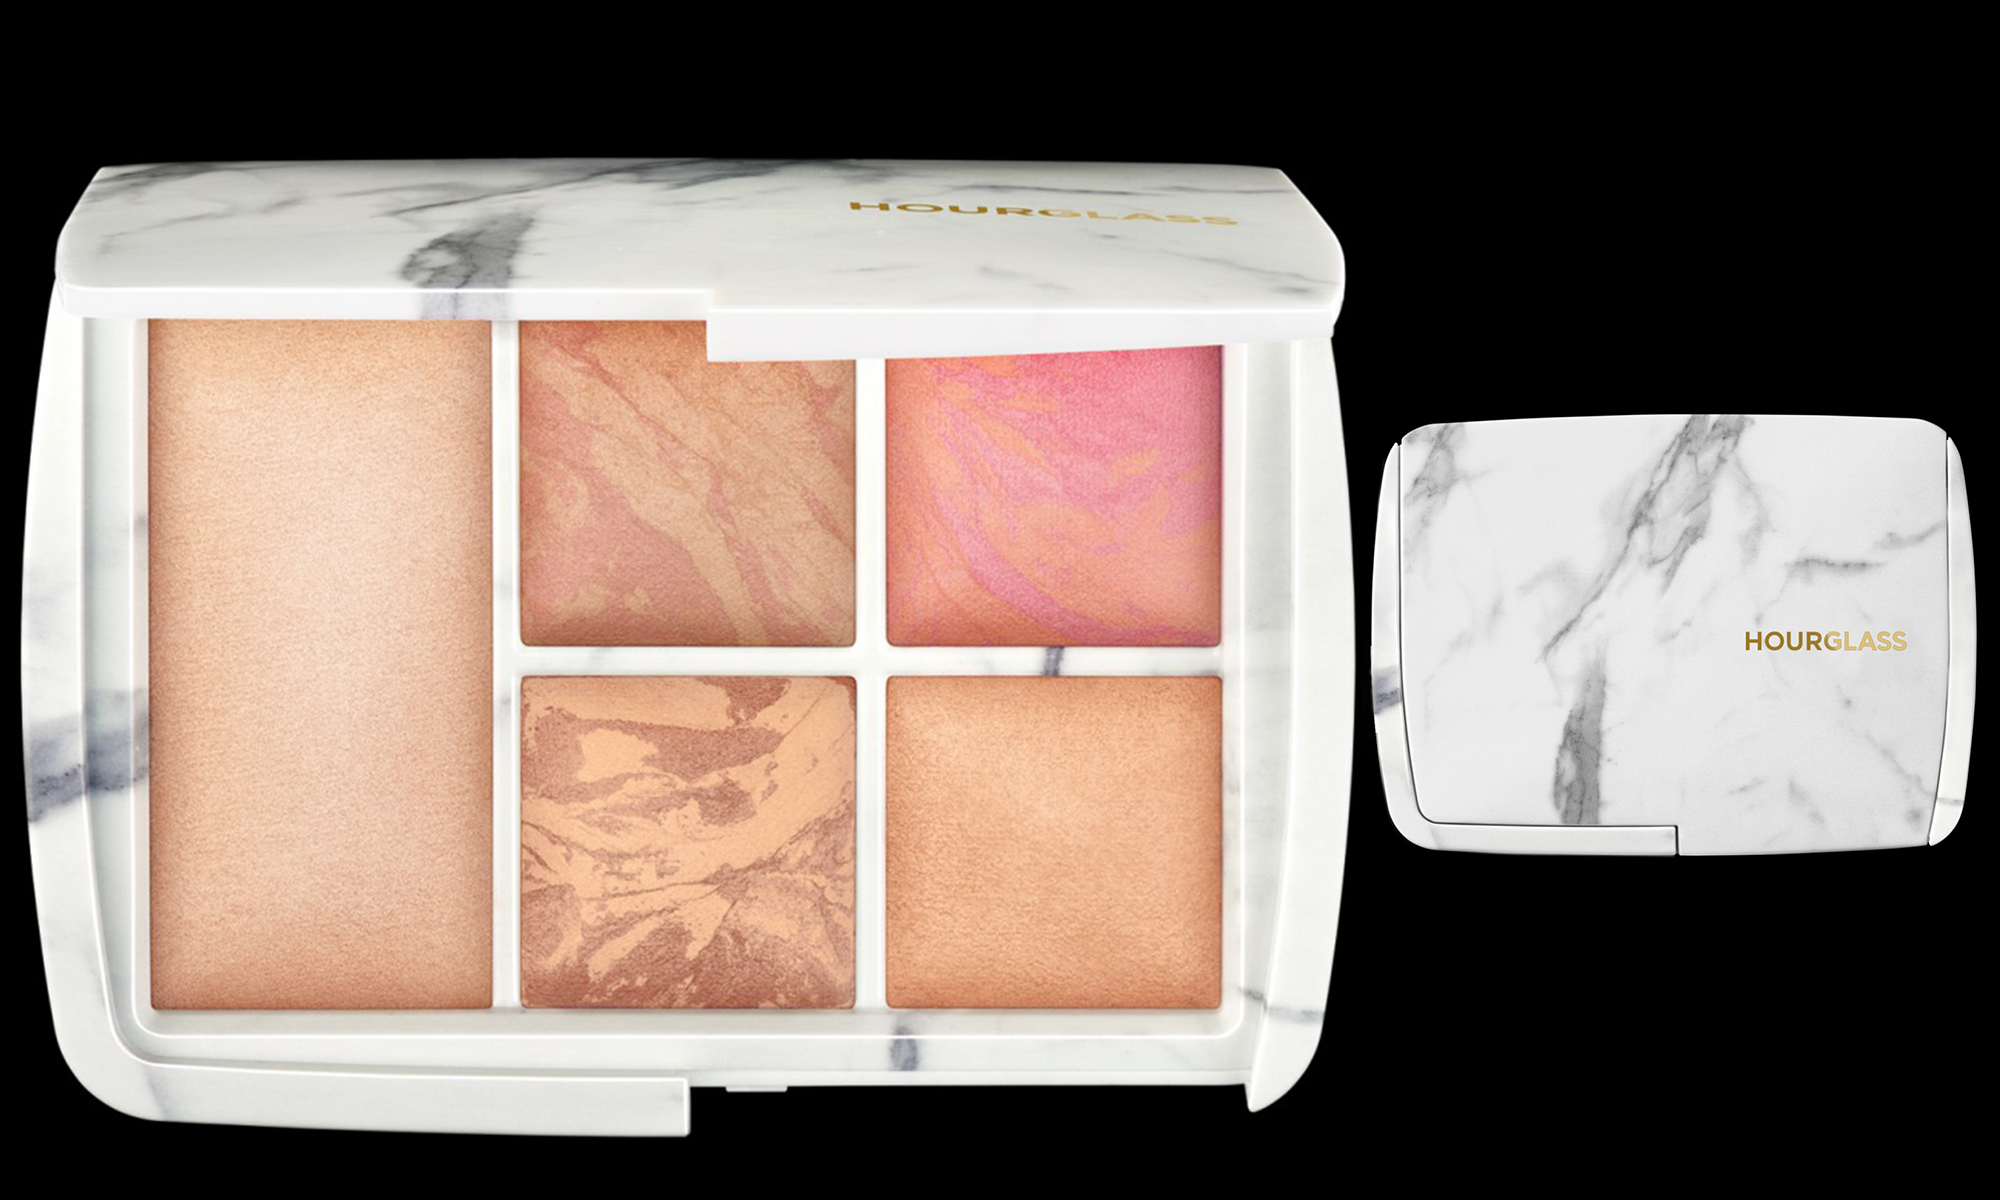 Image via Hourglass Cosmetics